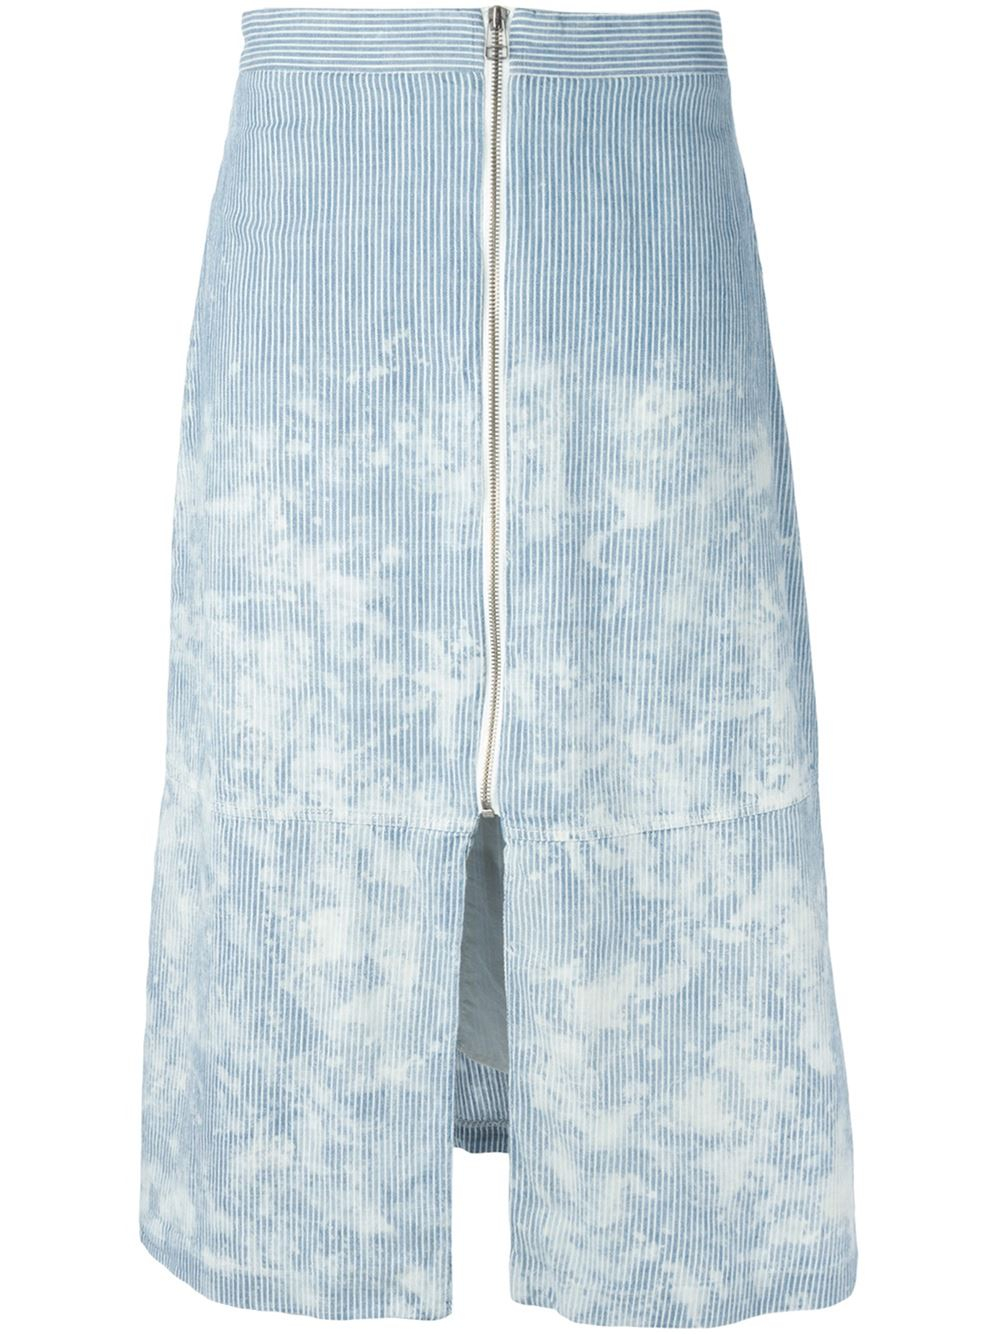 sea striped zip front denim skirt in blue lyst